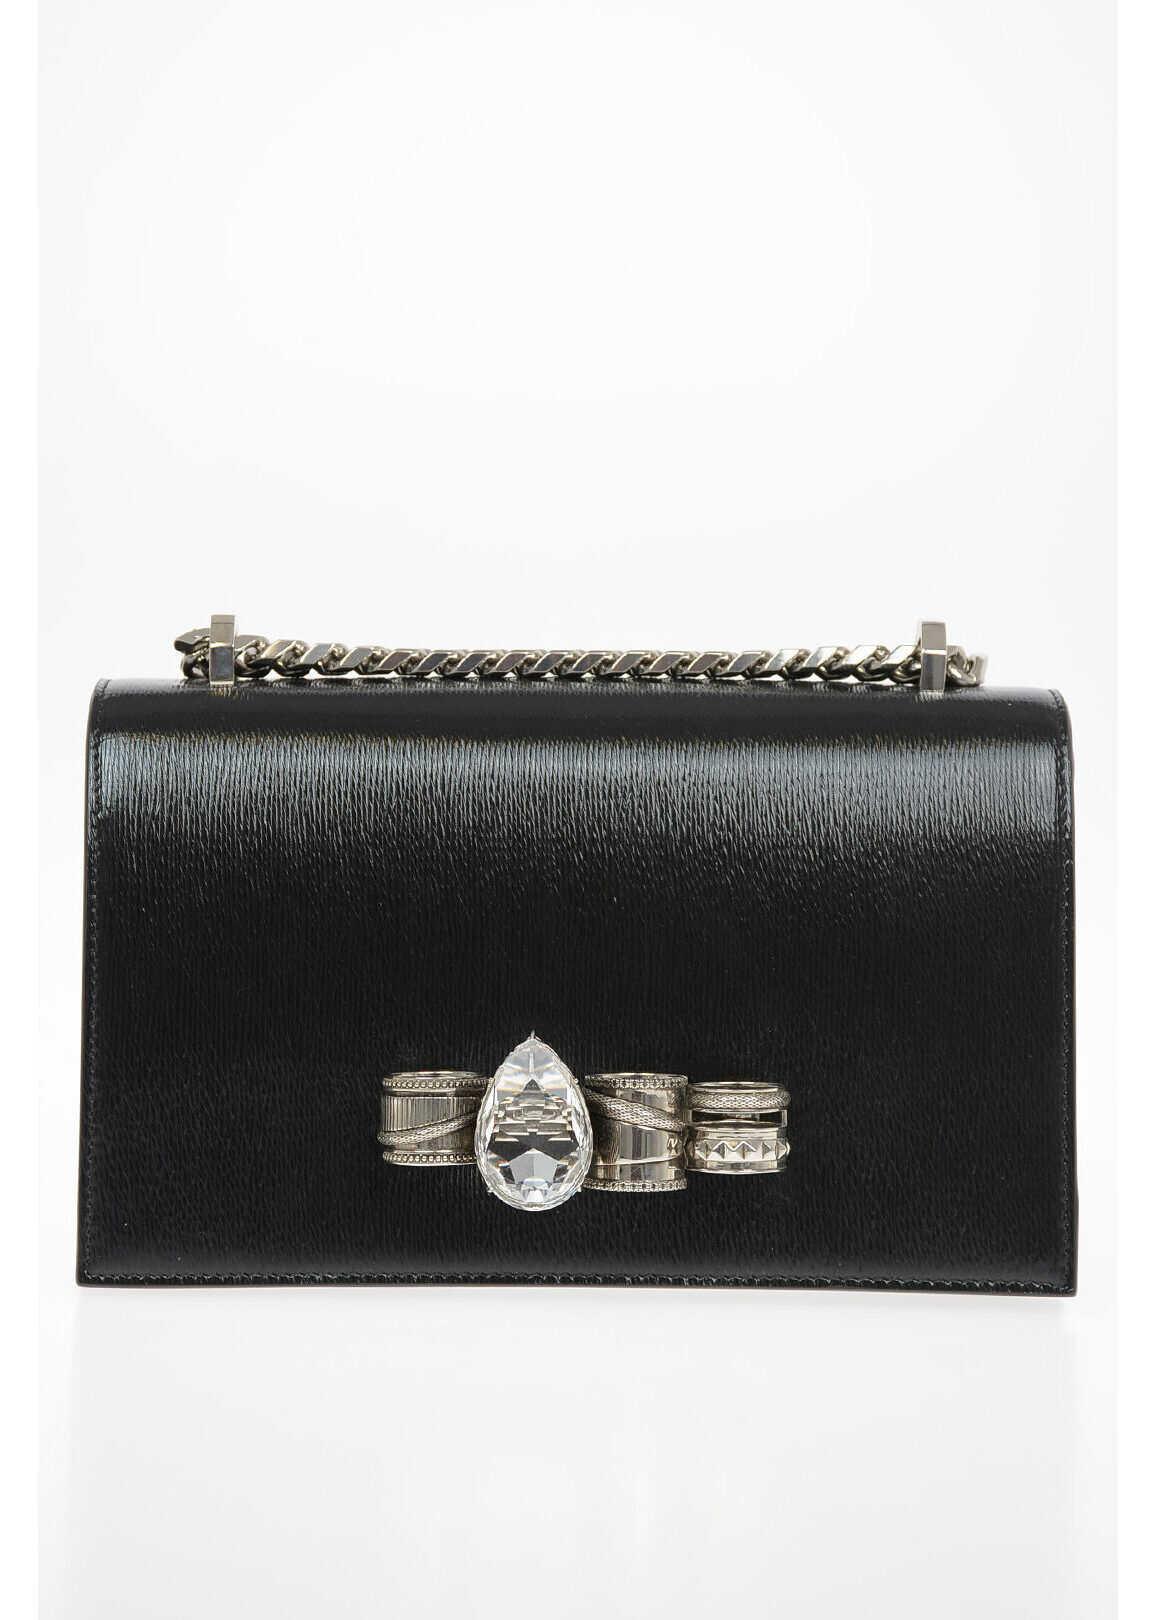 Alexander McQueen Leather FOUR RING Shoulder Bag BLACK imagine b-mall.ro